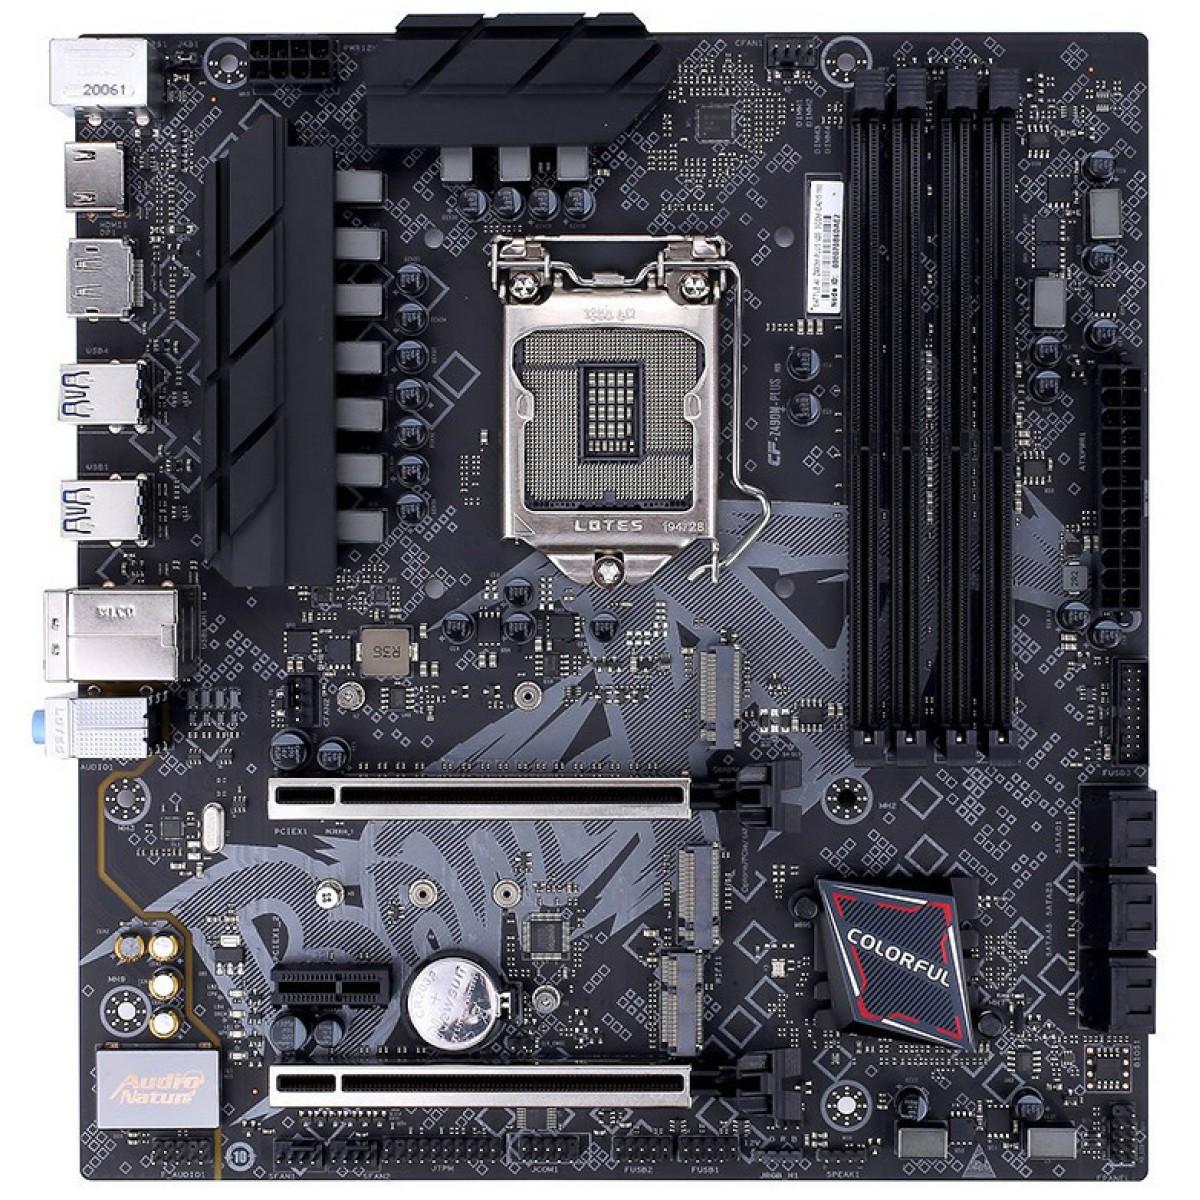 Placa Mãe Colorful BATTLE-AX Z490M-PLUS V20, Chipset Z490, Intel LGA 1200, mAXT, DDR4, 110001206701